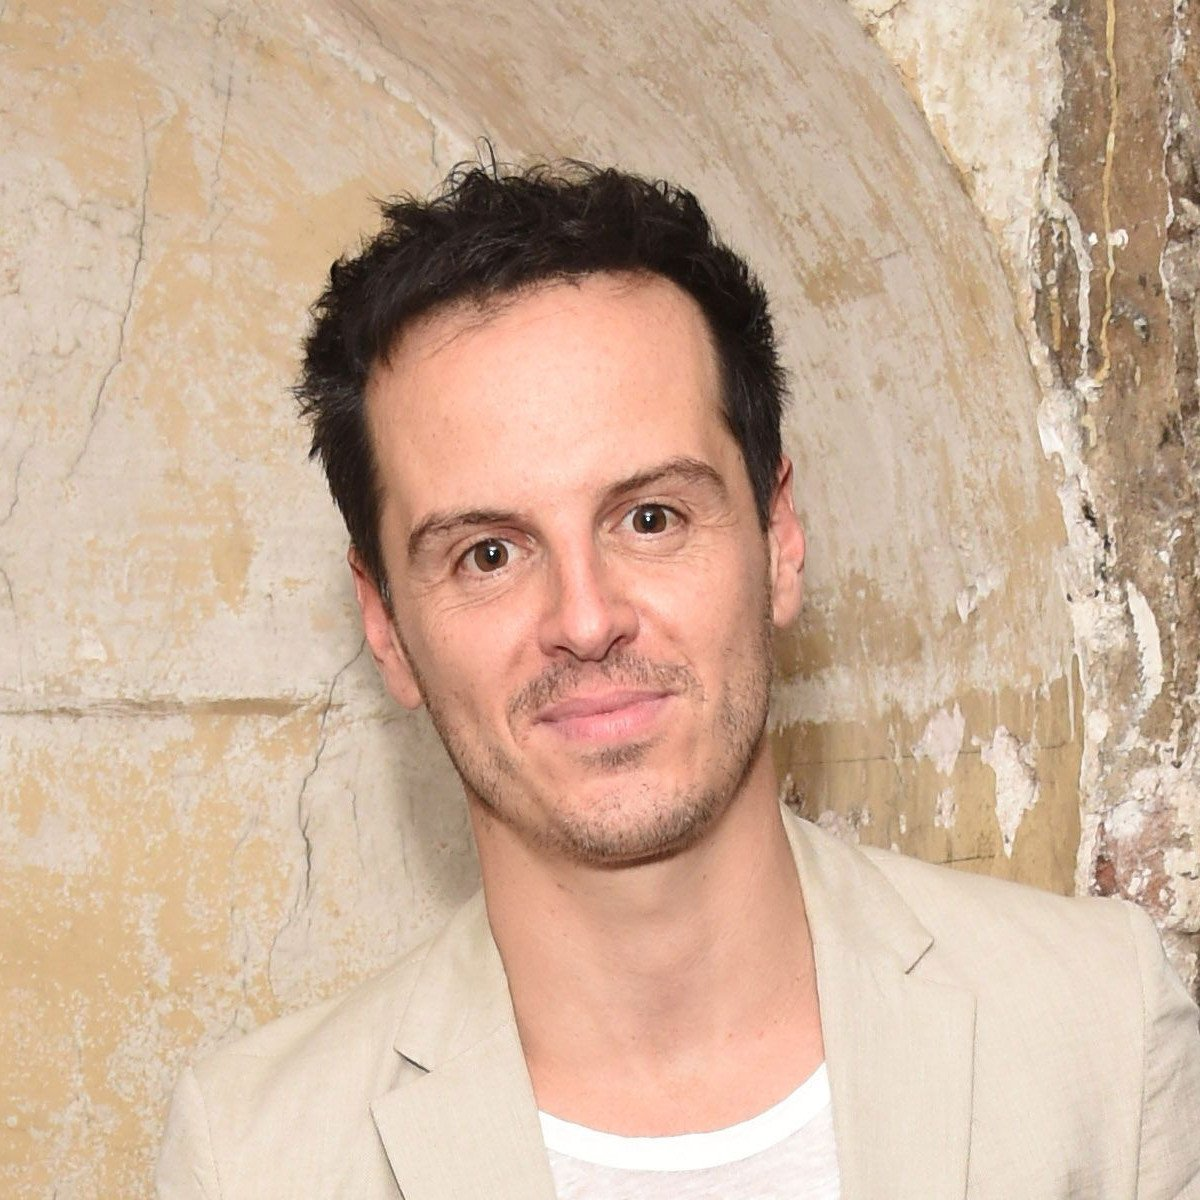 #Sherlock's Andrew Scott Joins HBO's His Dark Materials. #AndrewScott #HBO #HisDarkMaterials - https://t.co/KX92rjwsLh https://t.co/QlJyiknTlw